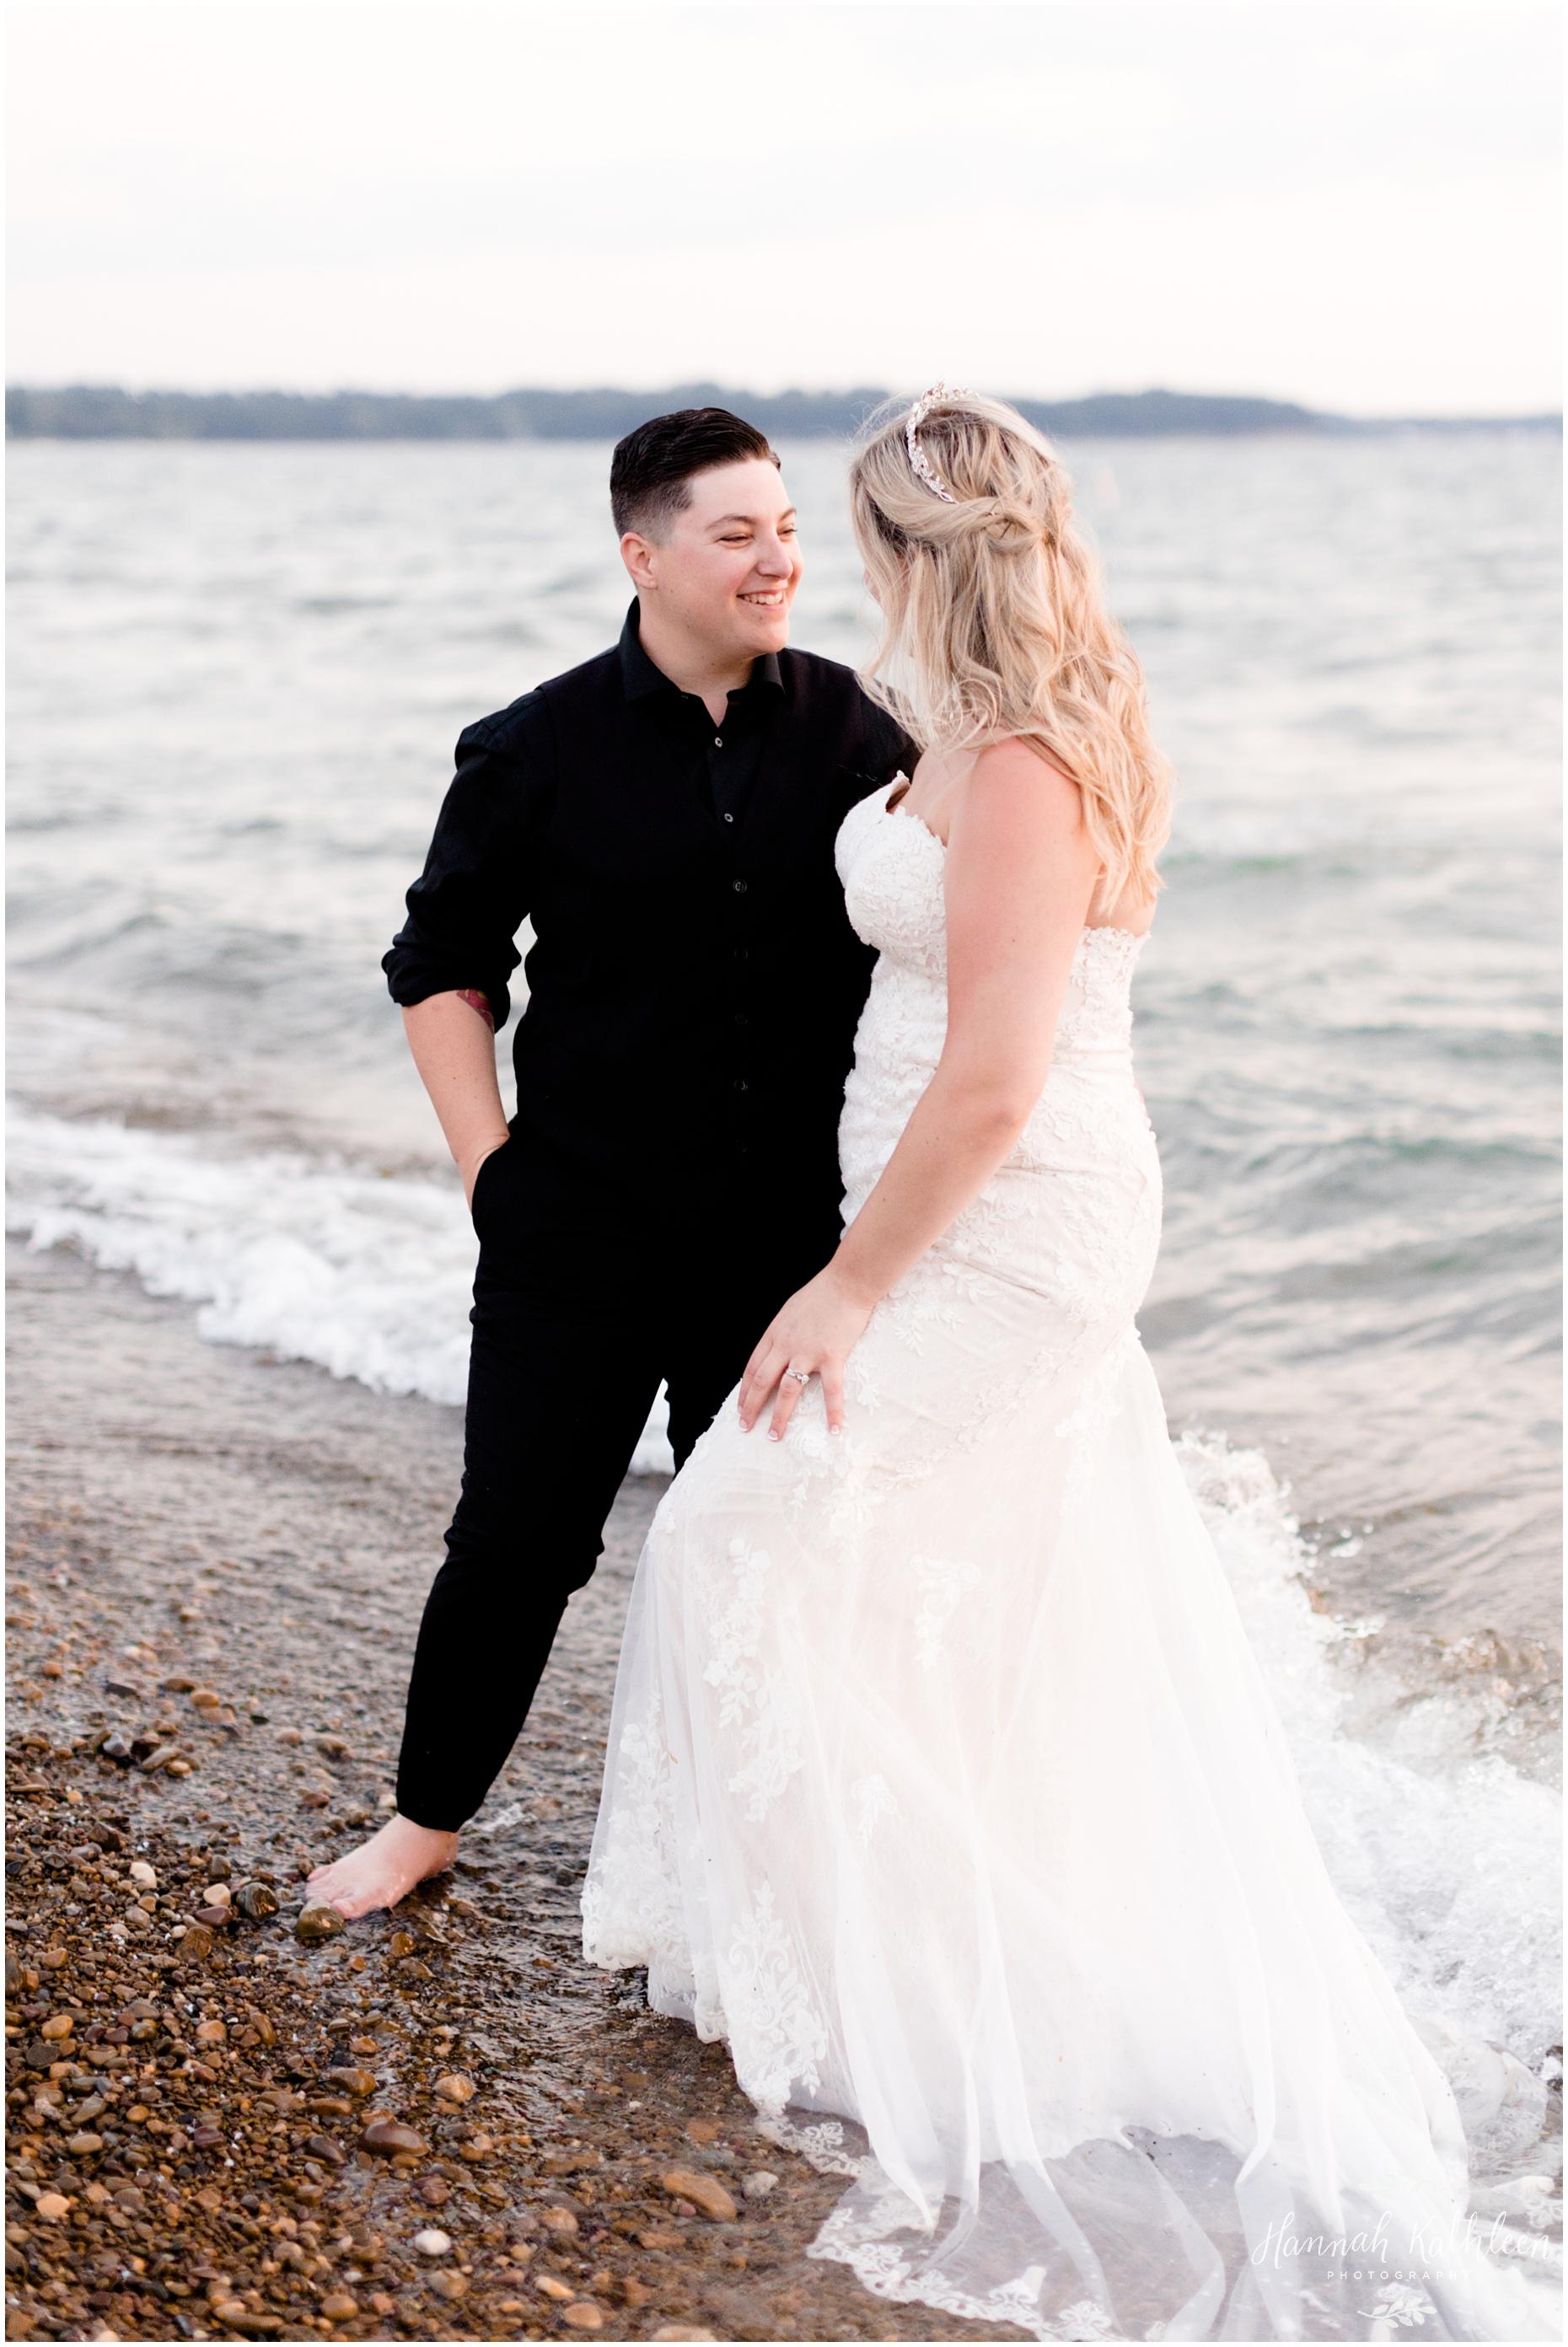 sunset-bay-lake-erie-beach-small-wedding-elopement-trash-the-dress-lgbtq-photographer